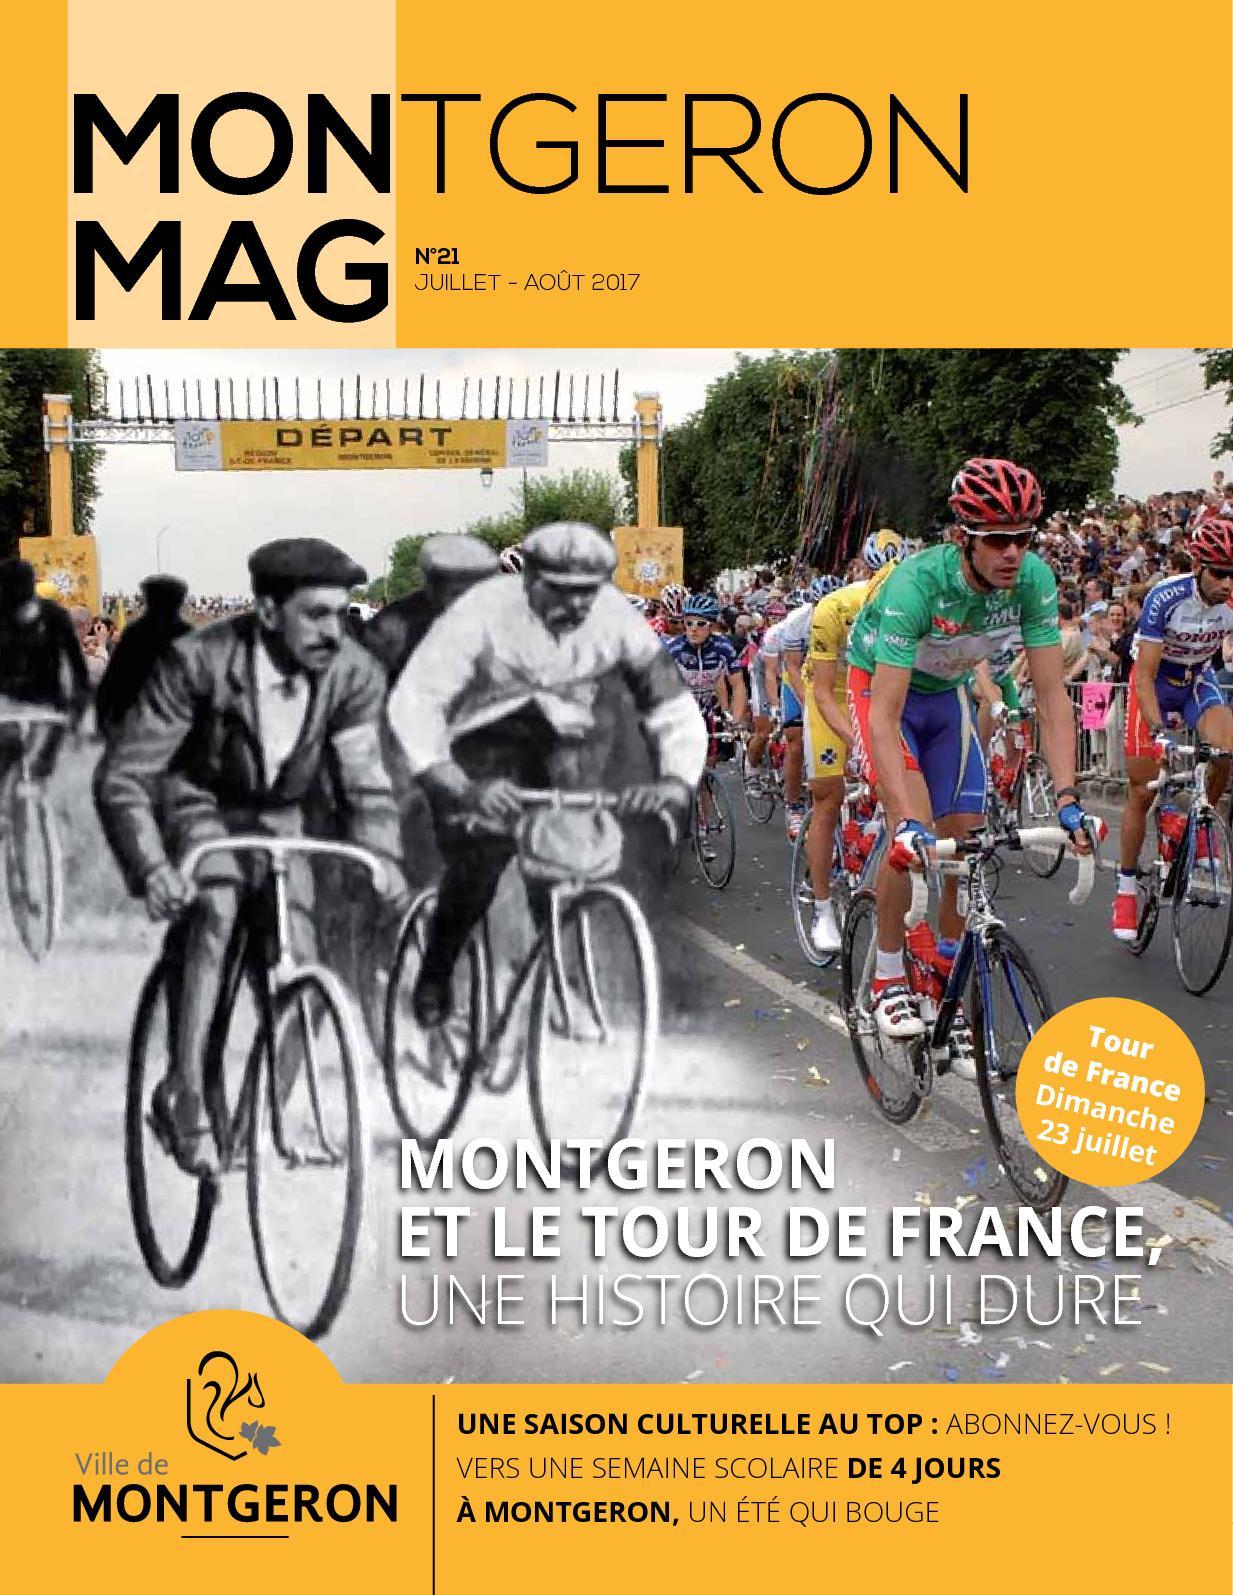 Calam o mon mag n 21 juillet aout 2017 for Piscine montgeron